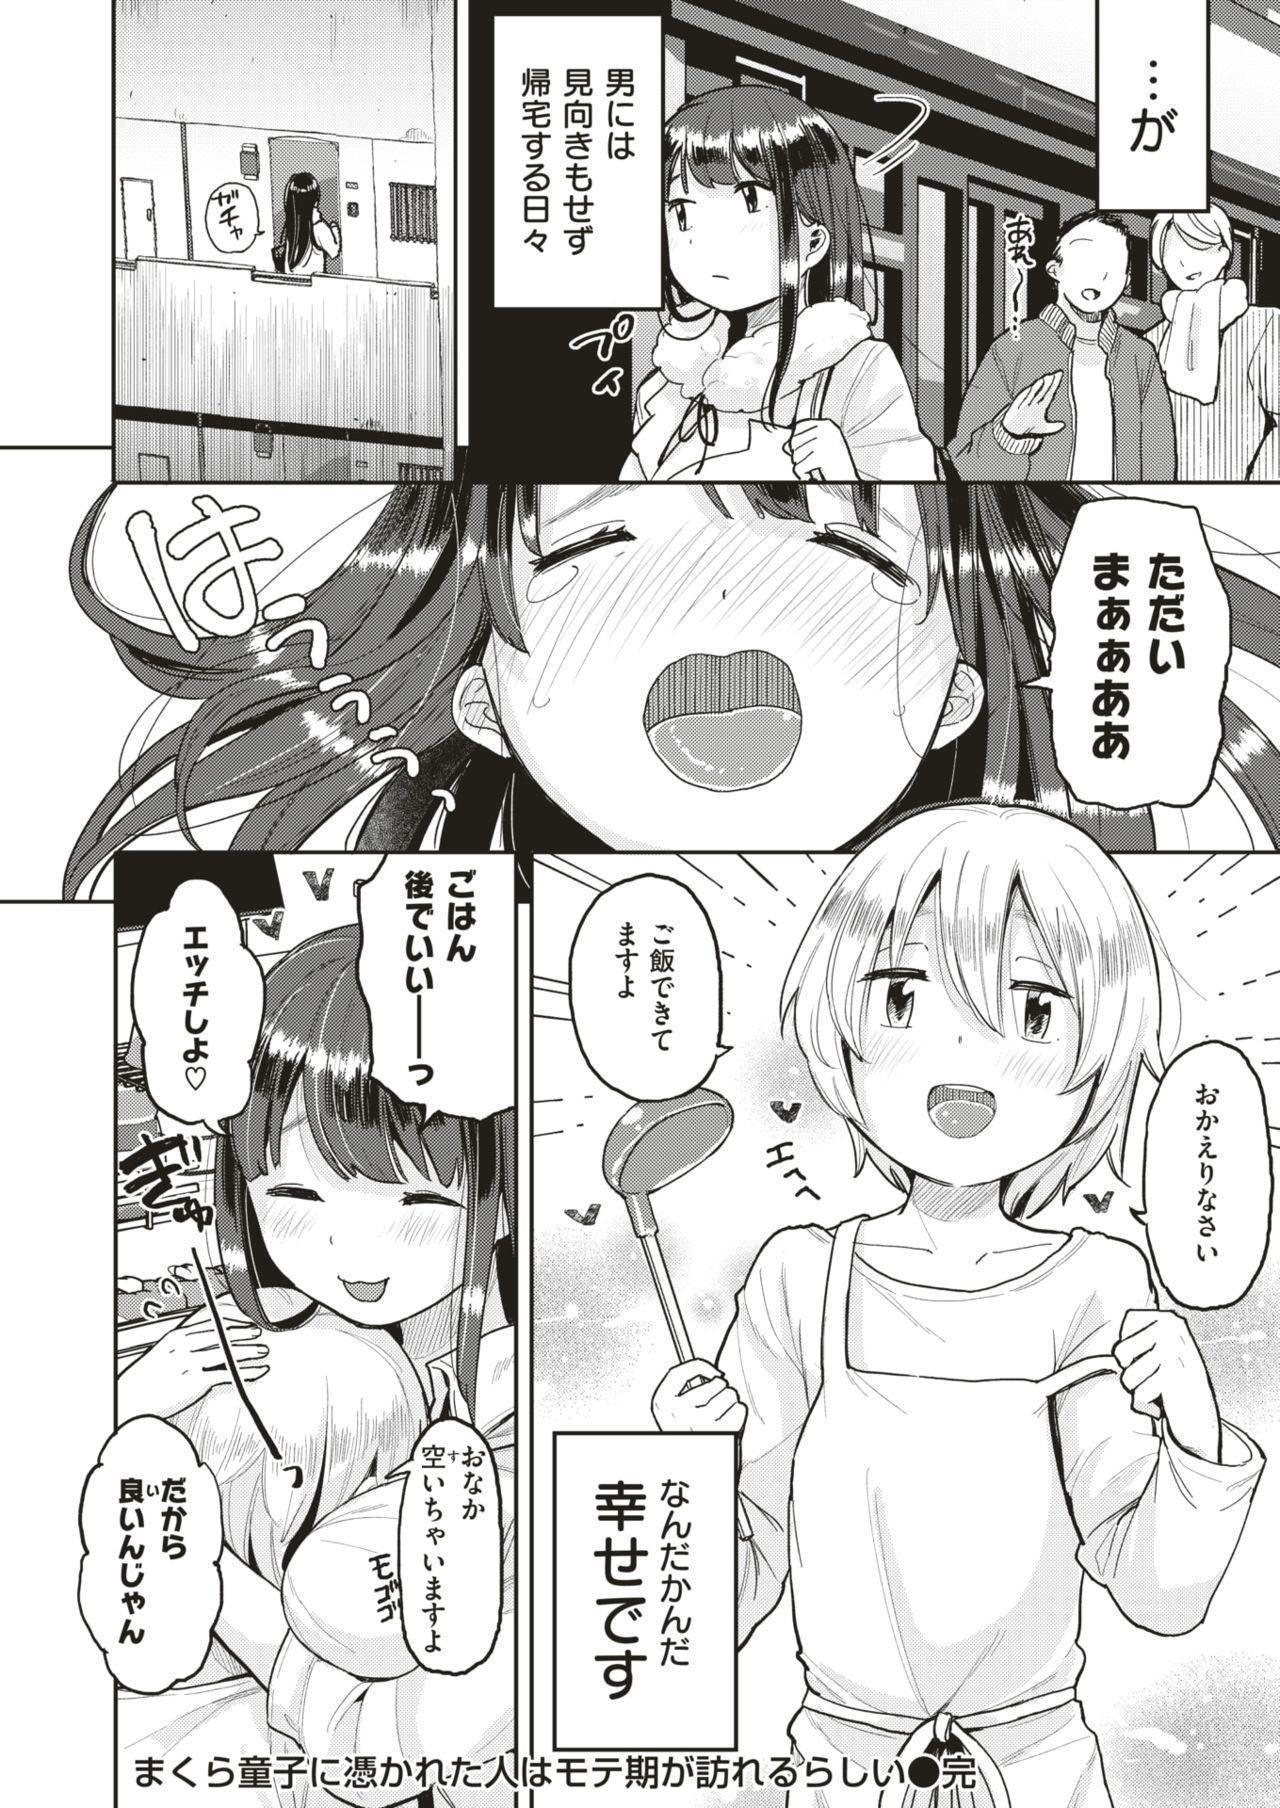 COMIC HAPPINING Vol. 4 68